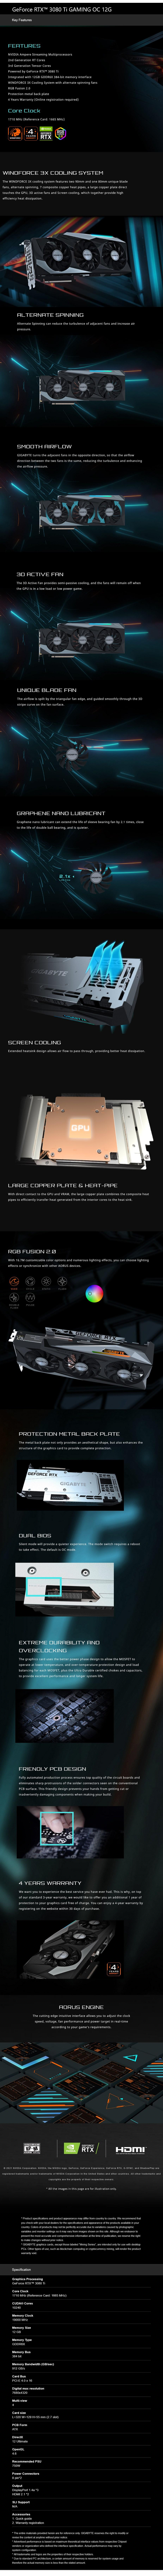 Gigabyte GeForce RTX 3080 Ti GAMING OC 12GB Video Card - Desktop Overview 1